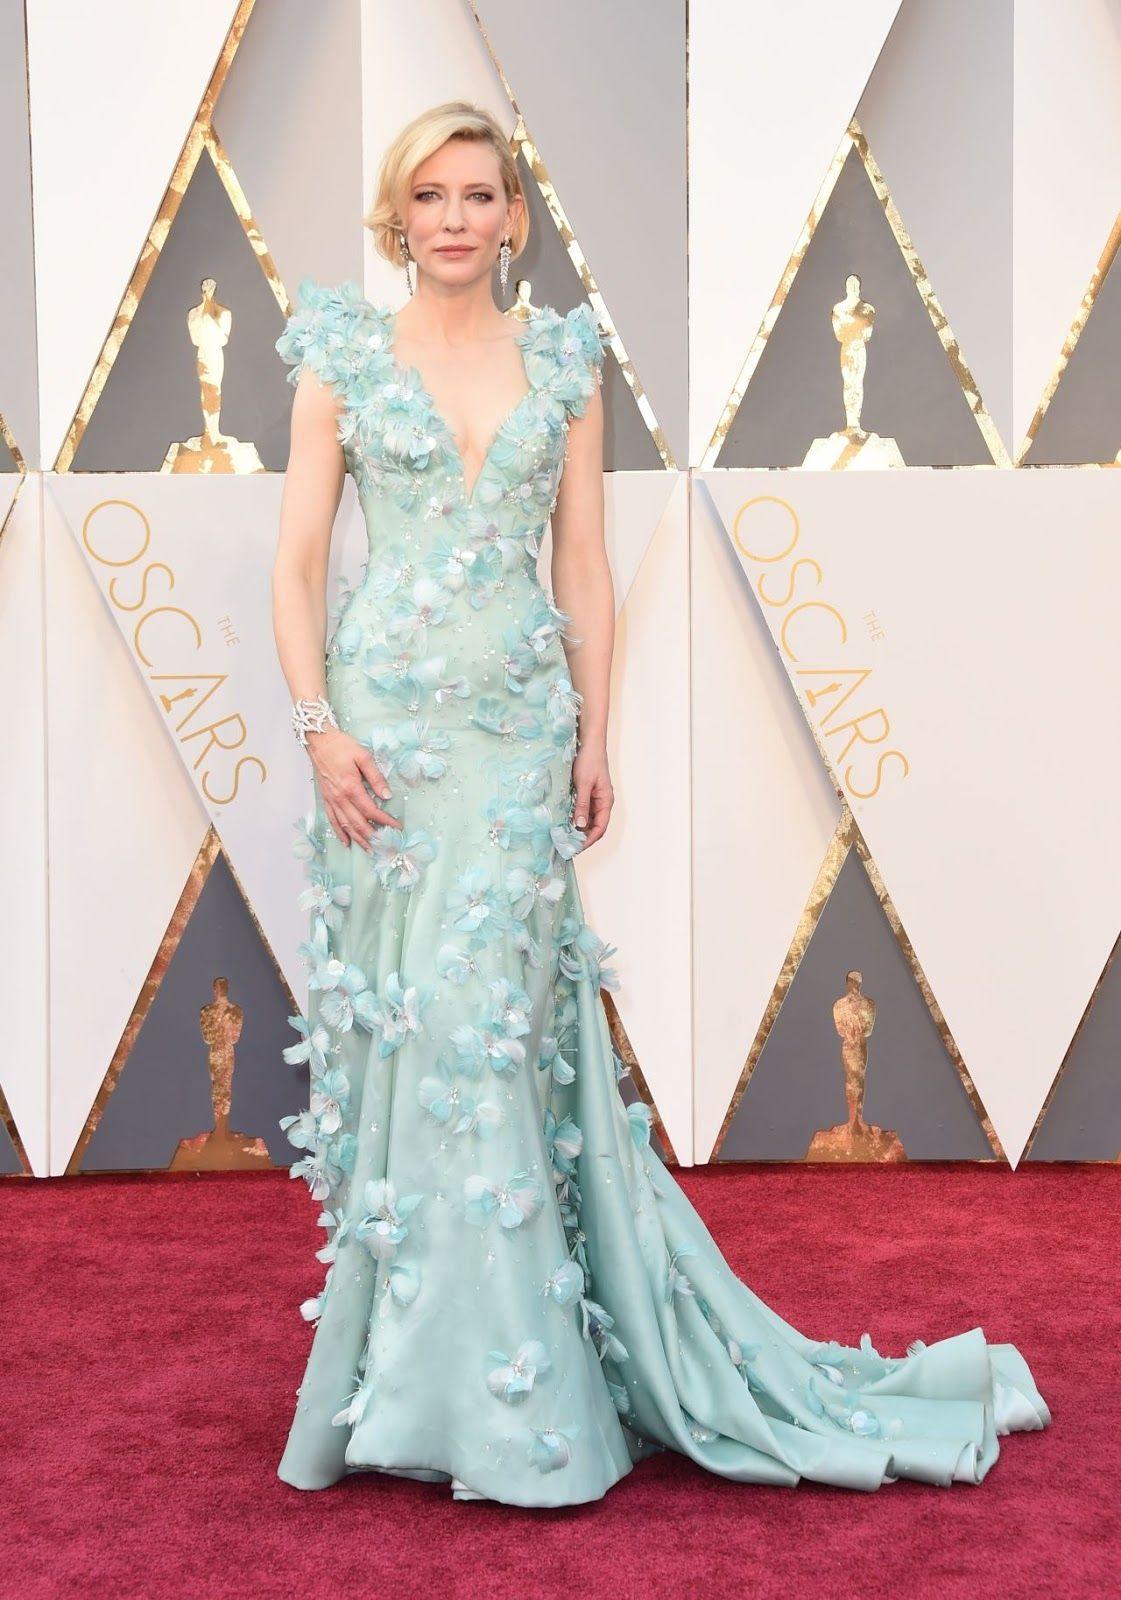 a3501e7dad73 Cate Blanchett in Armani, 2016 Oscars | Best Dress | Oscar dresses ...